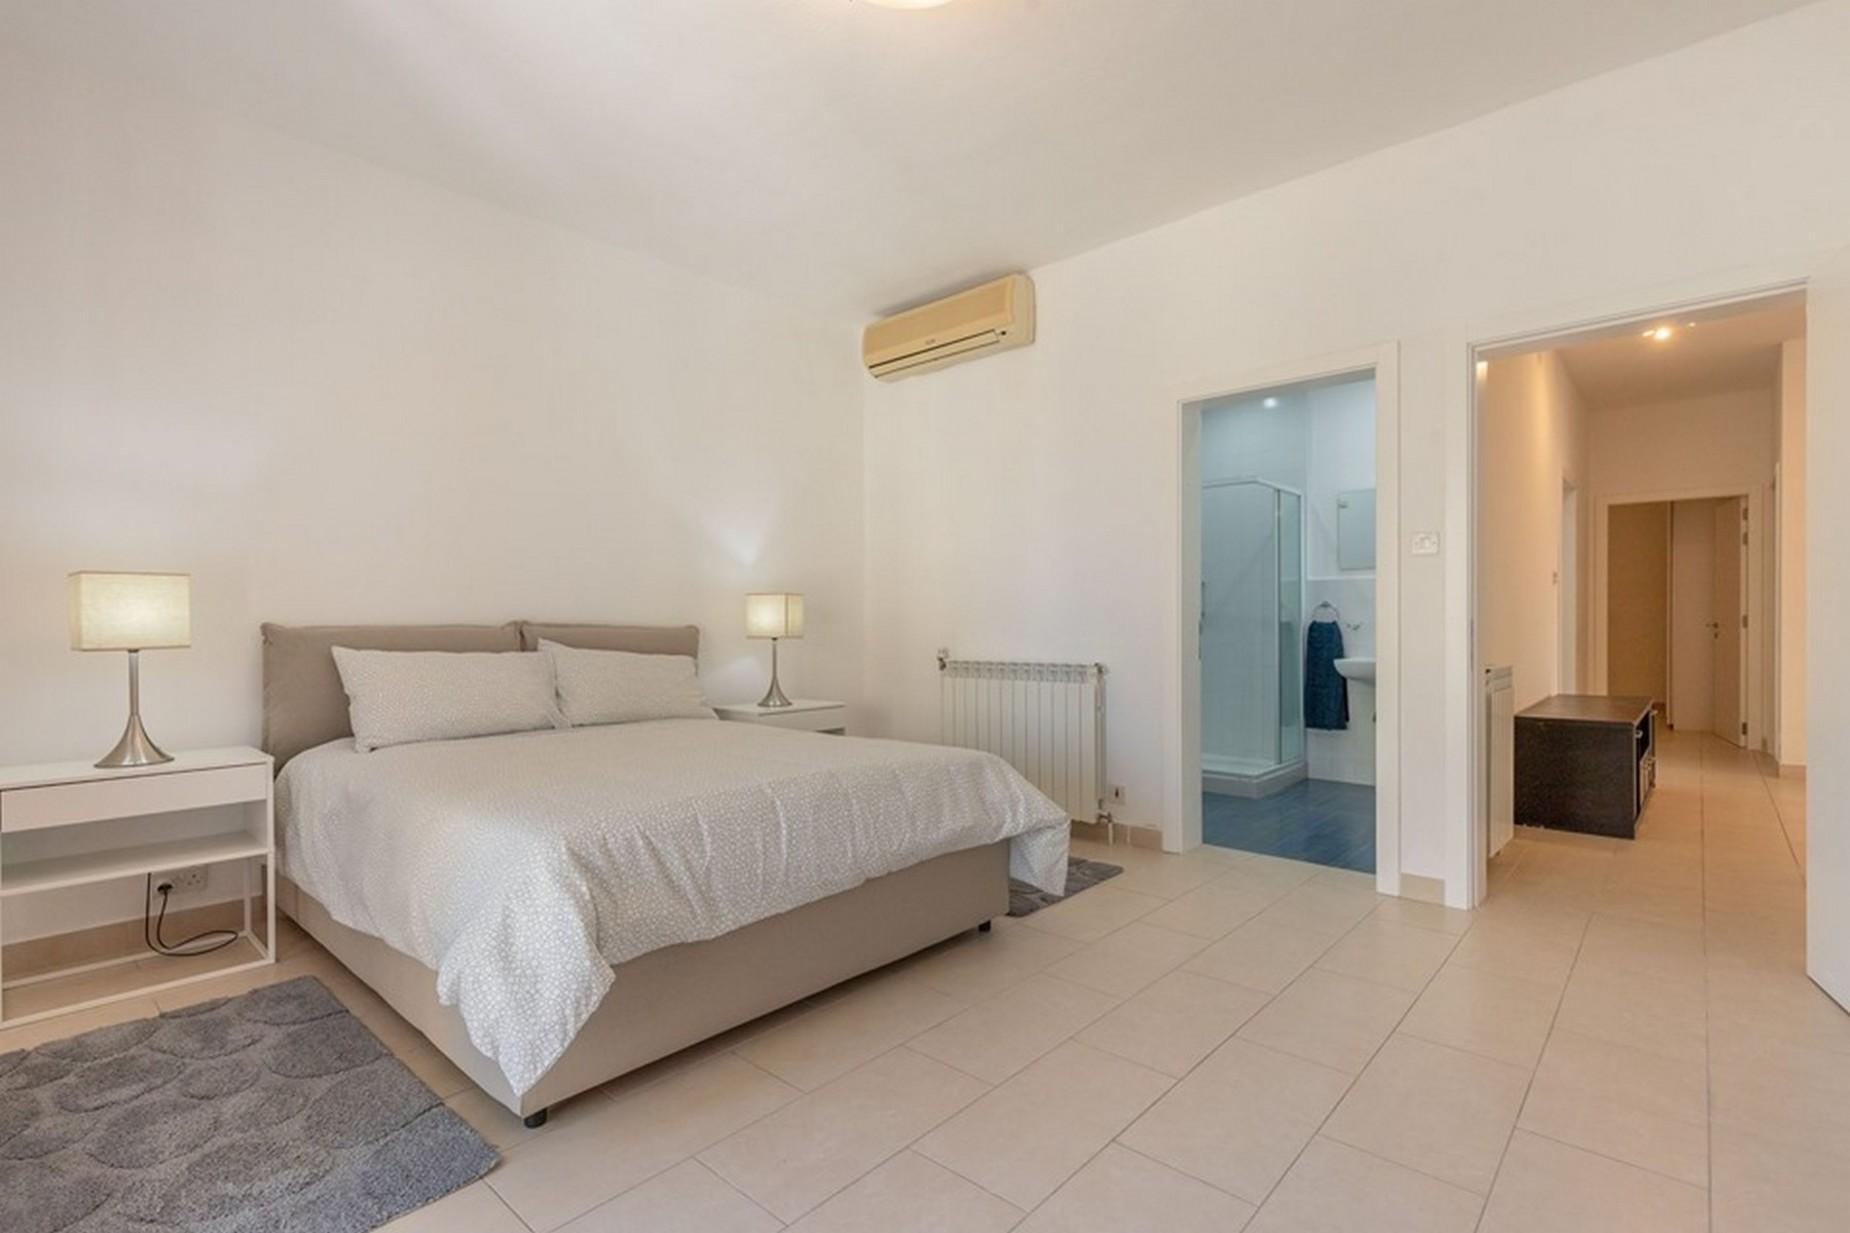 3 bed Maisonette For Rent in Ibragg, Ibragg - thumb 10